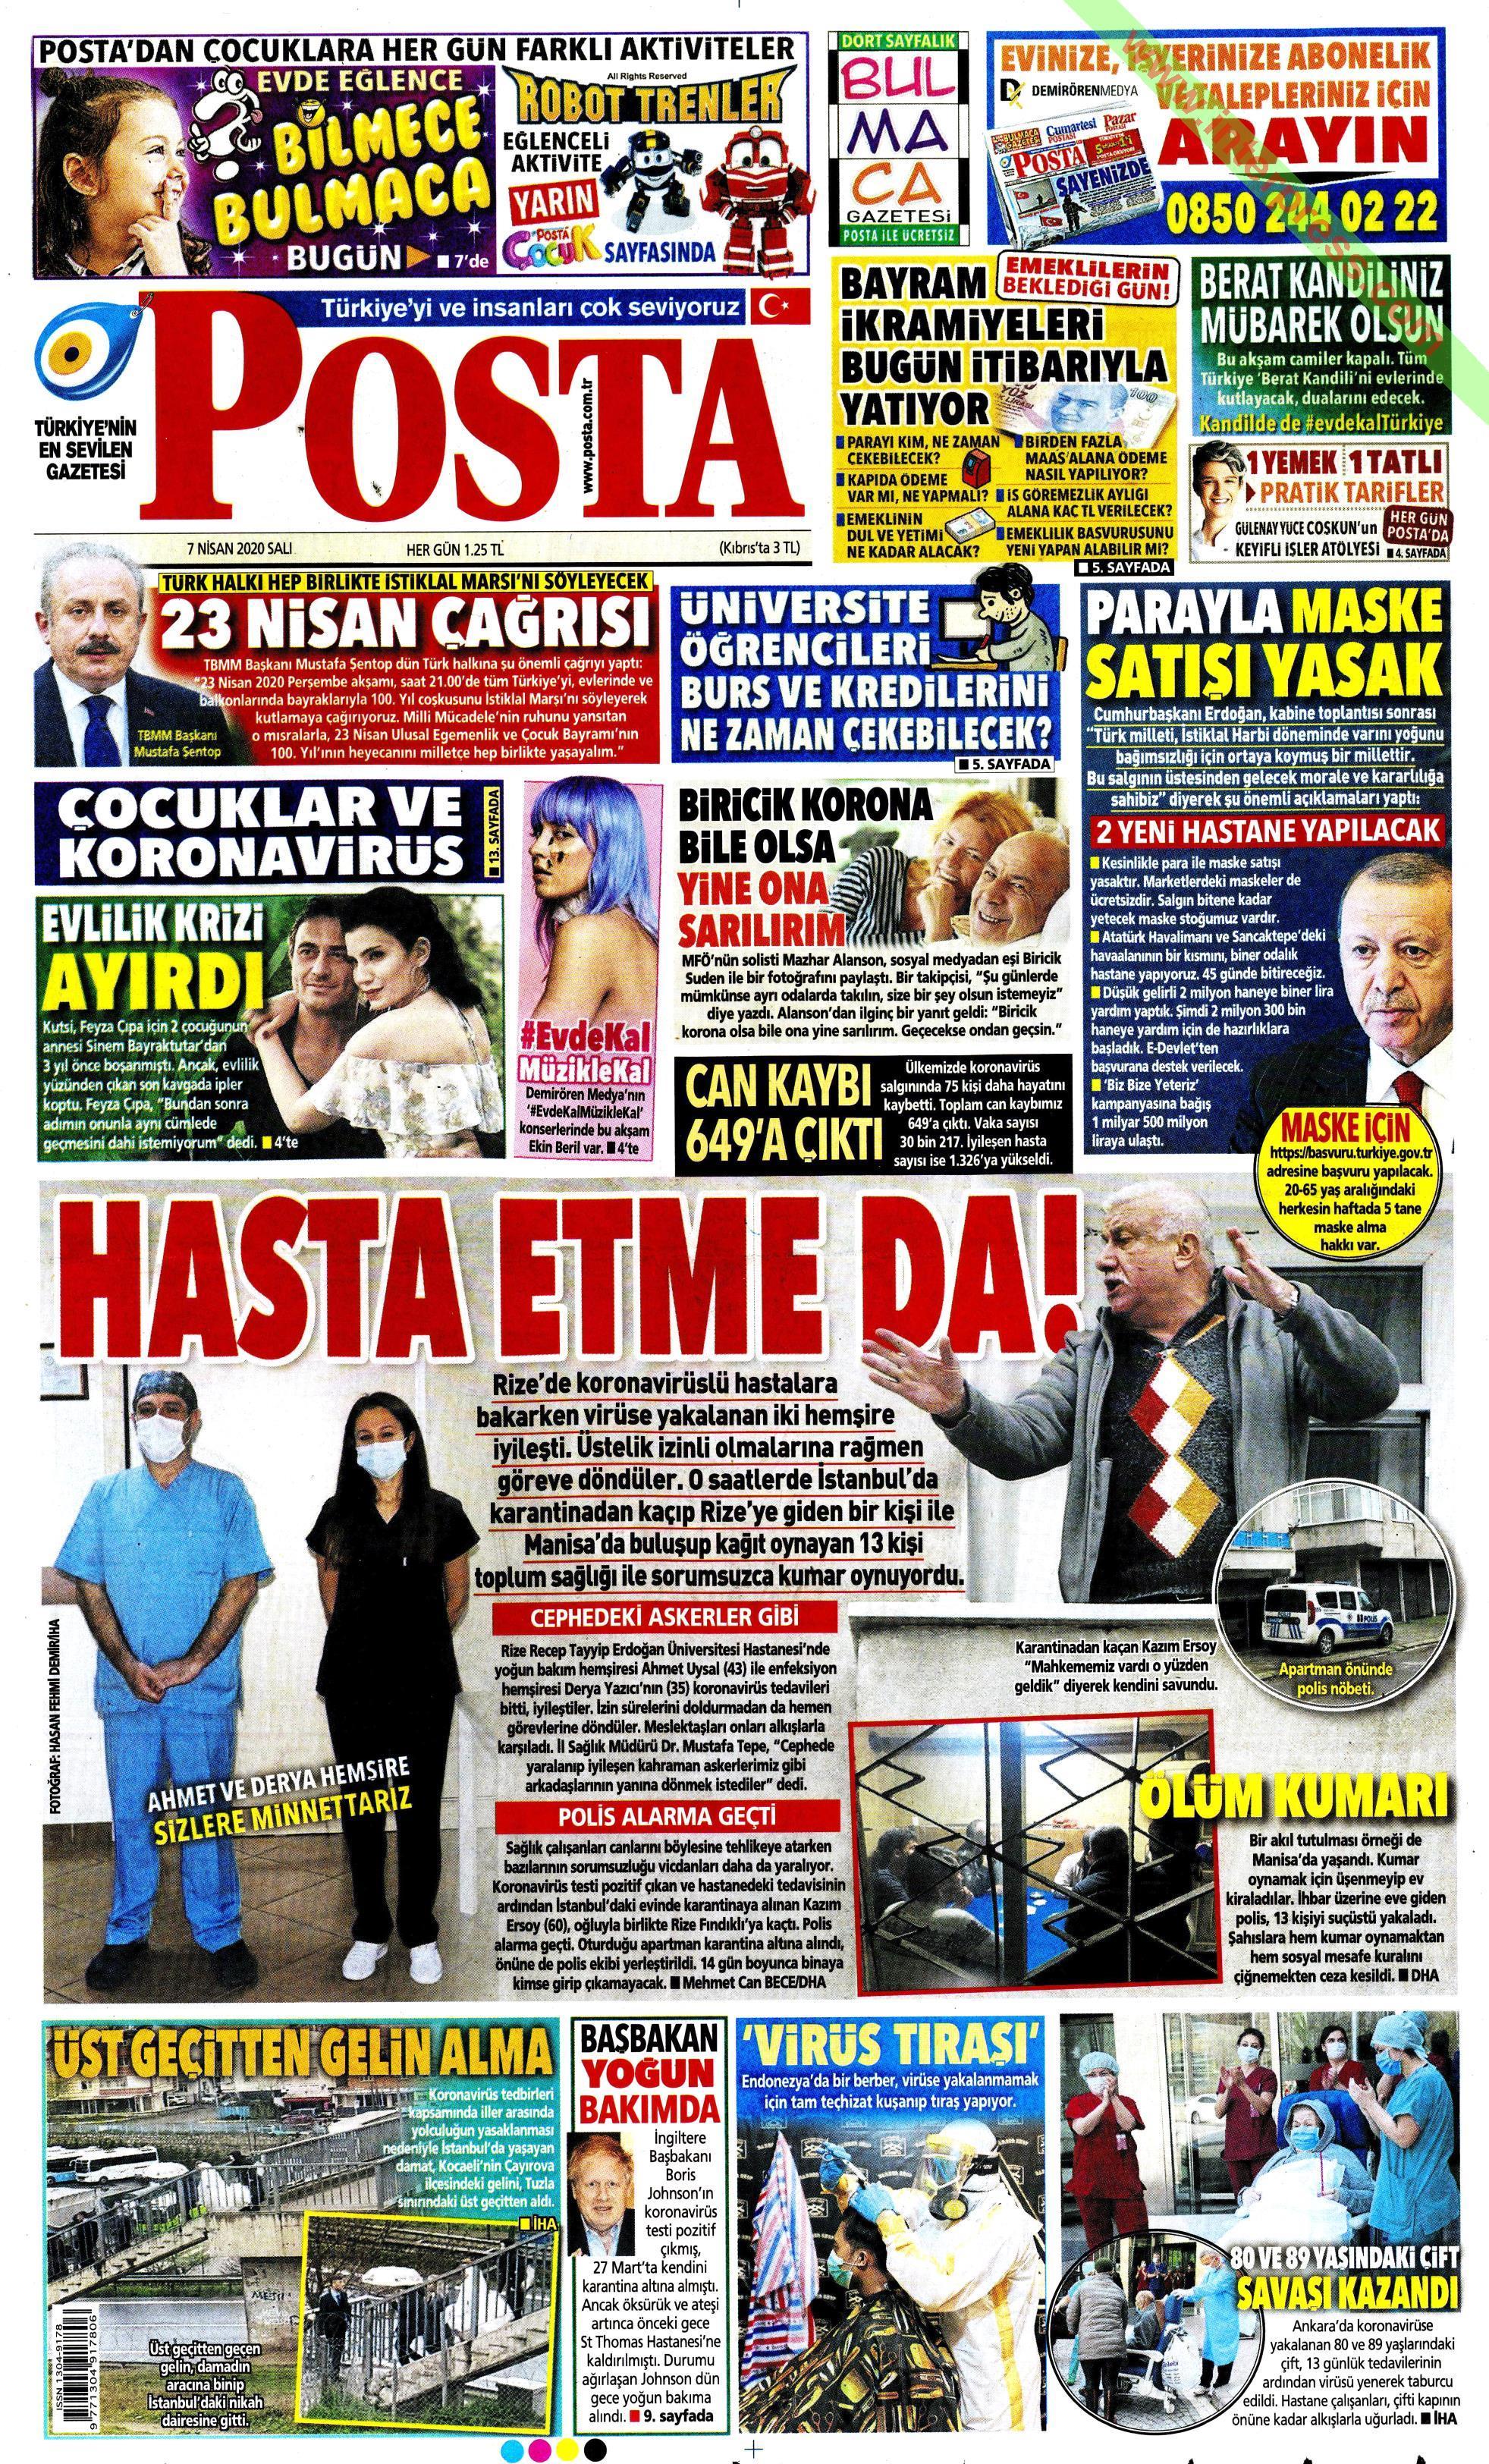 Posta gazetesi manşet ilk sayfa oku